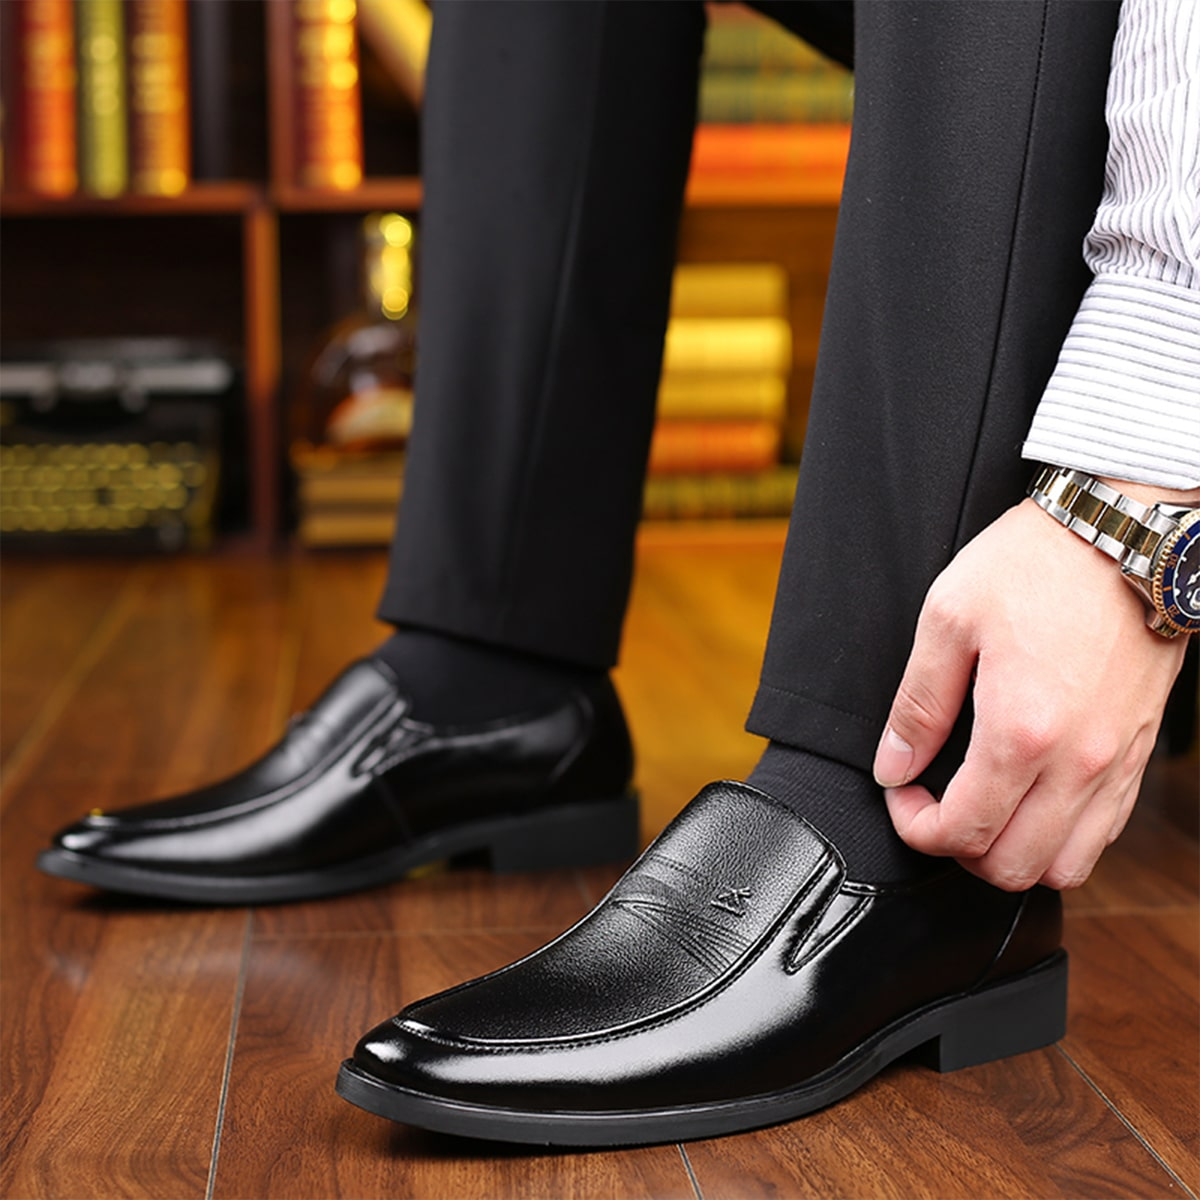 shein Vlak Gekleede schoenen